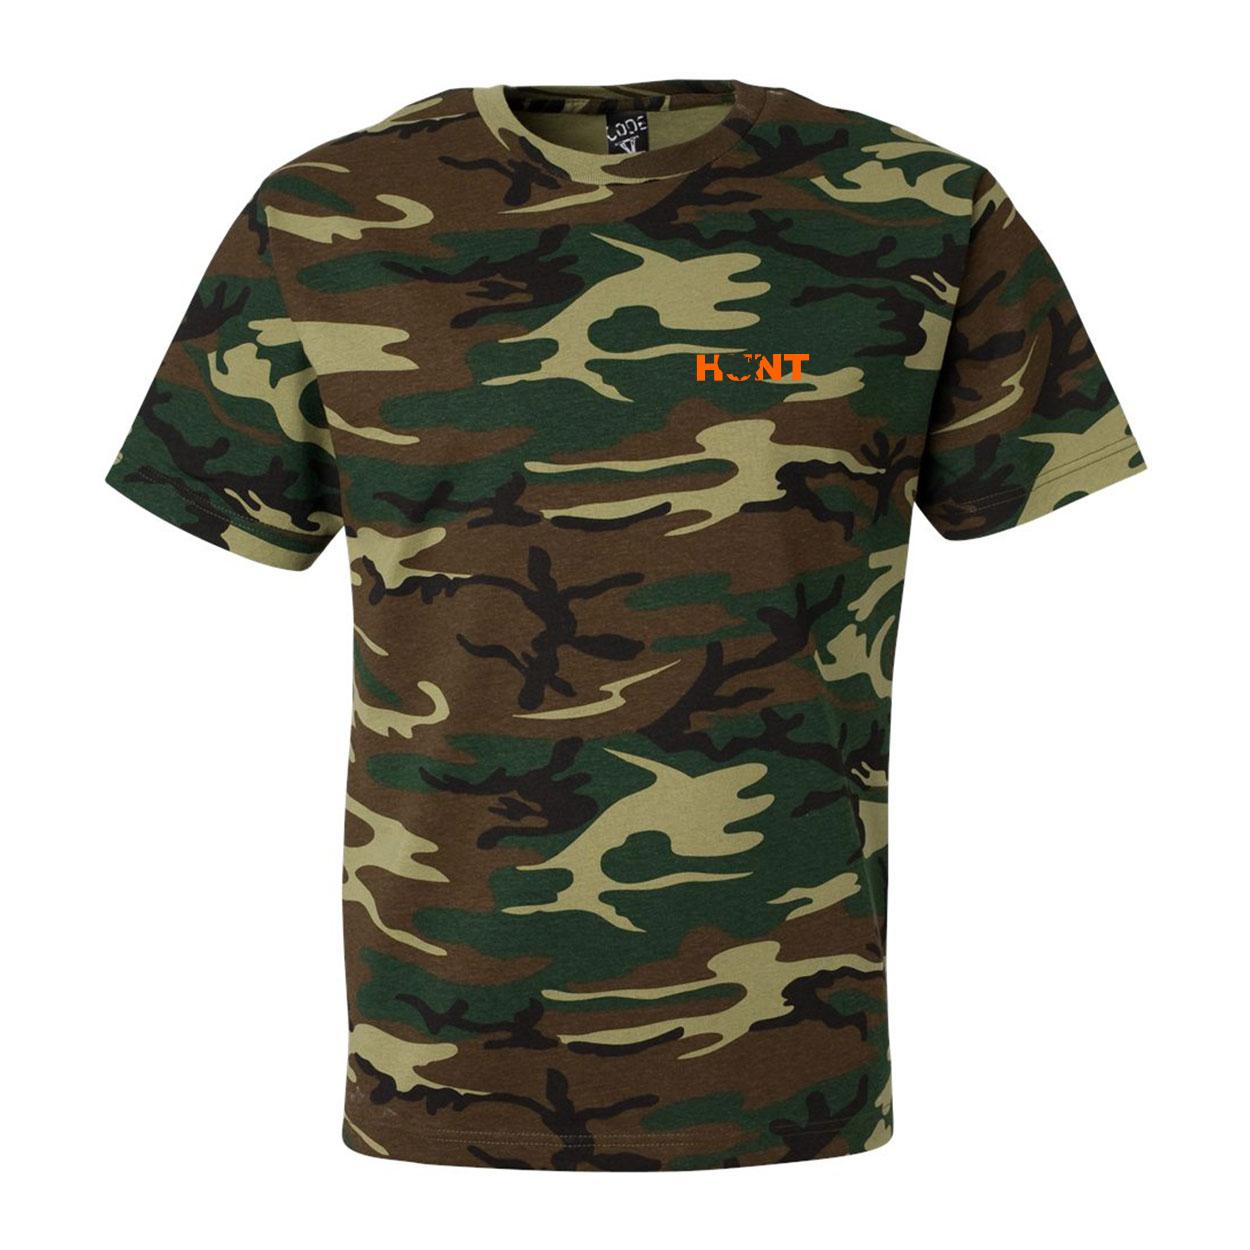 Hunt United States Night Out Premium T-Shirt Camo (Orange Logo)